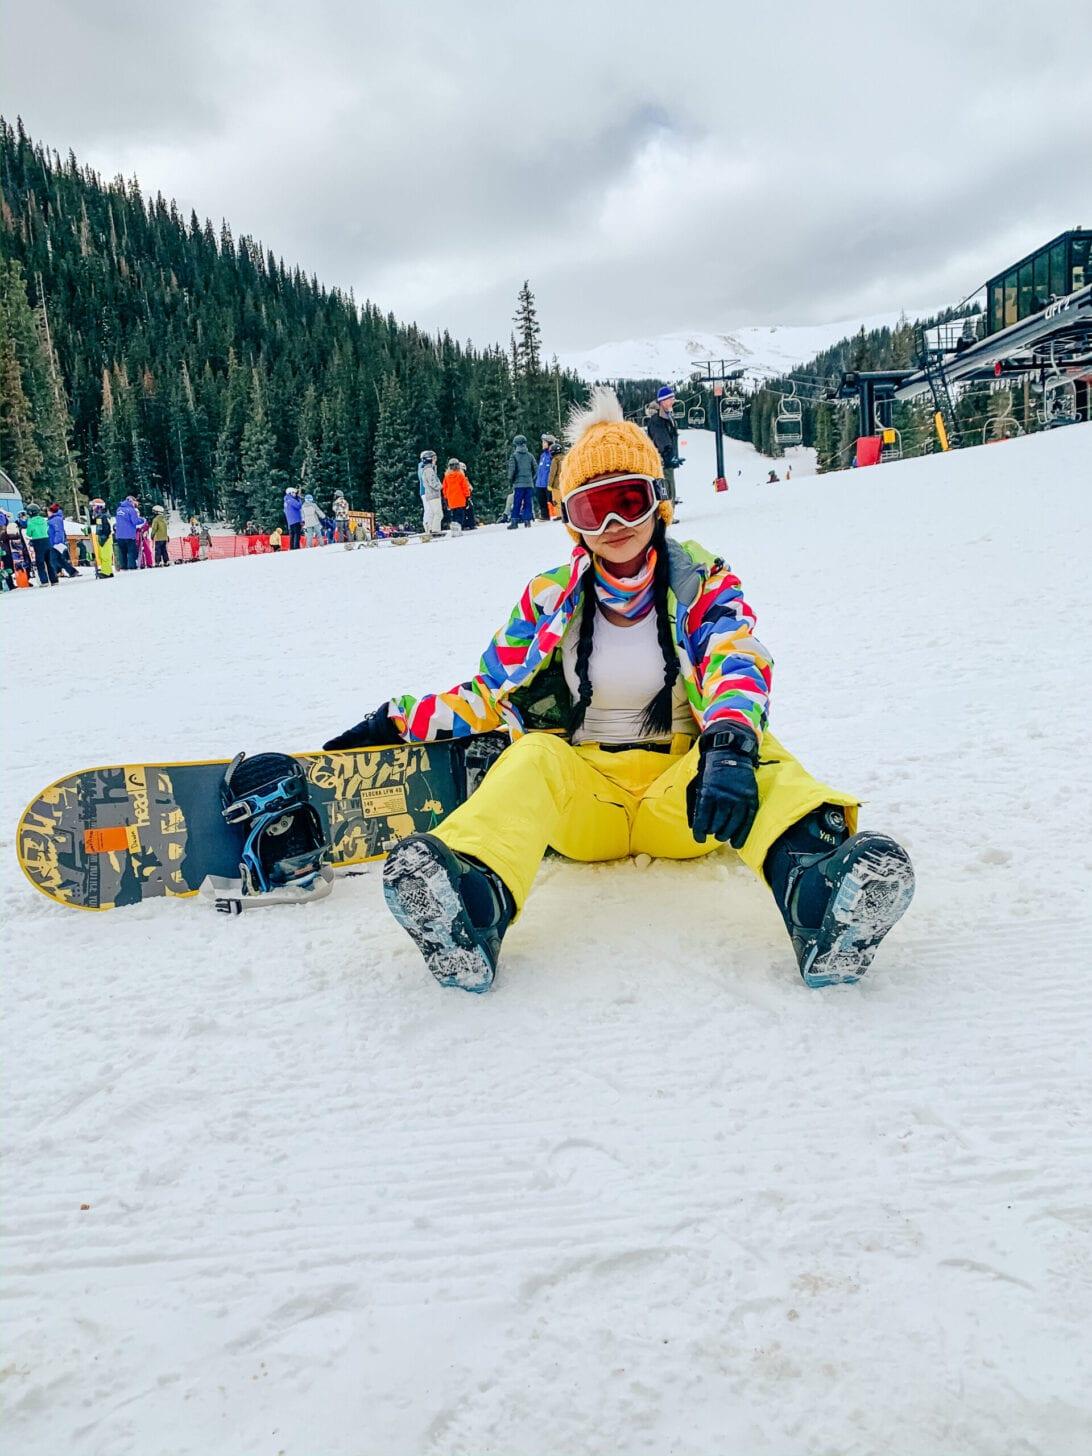 SNOWBOARDING, SNOW BOARDING, SLOPES, LOVELAND PASS